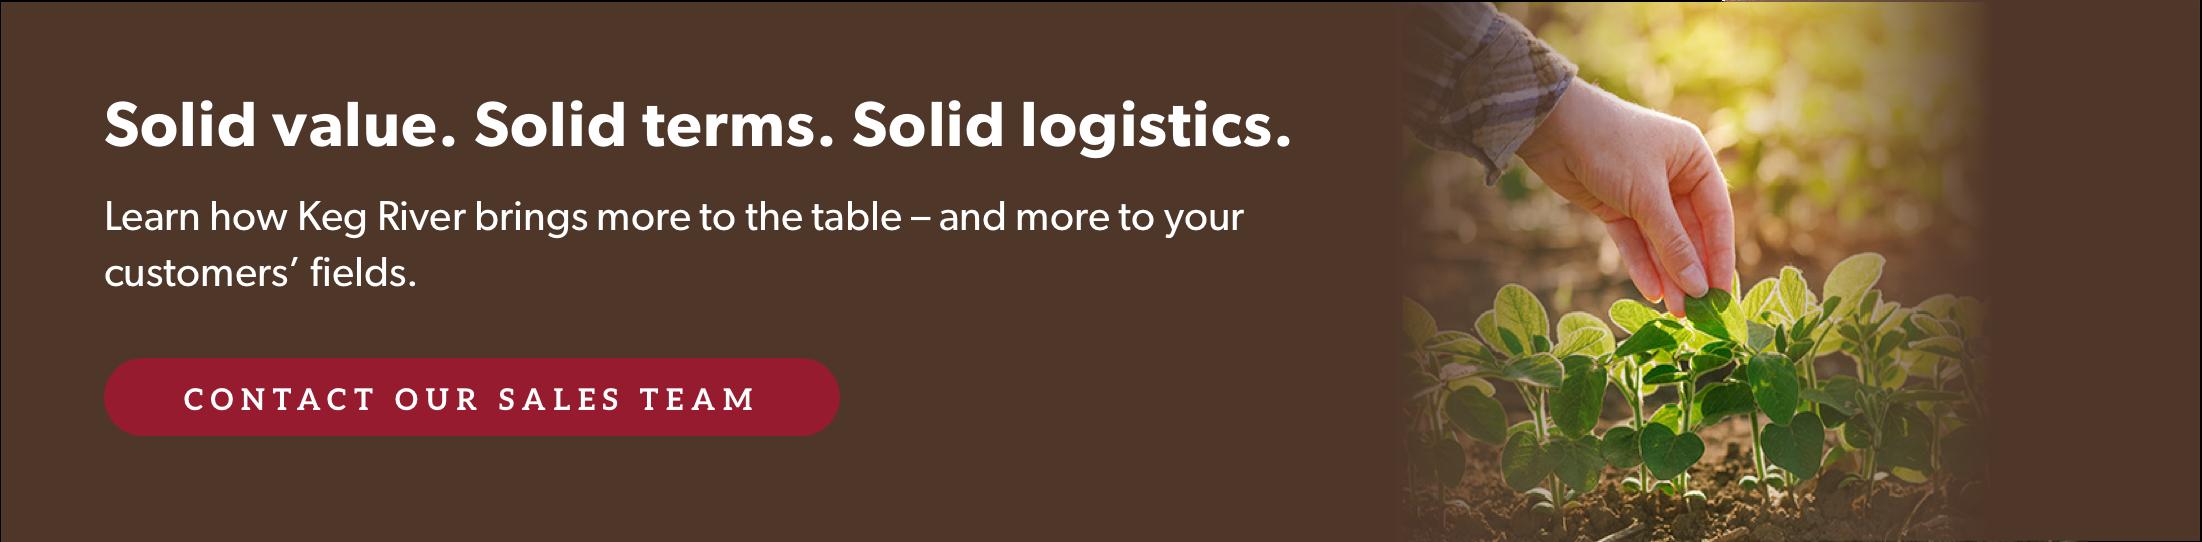 Solid Value Terms Logistics